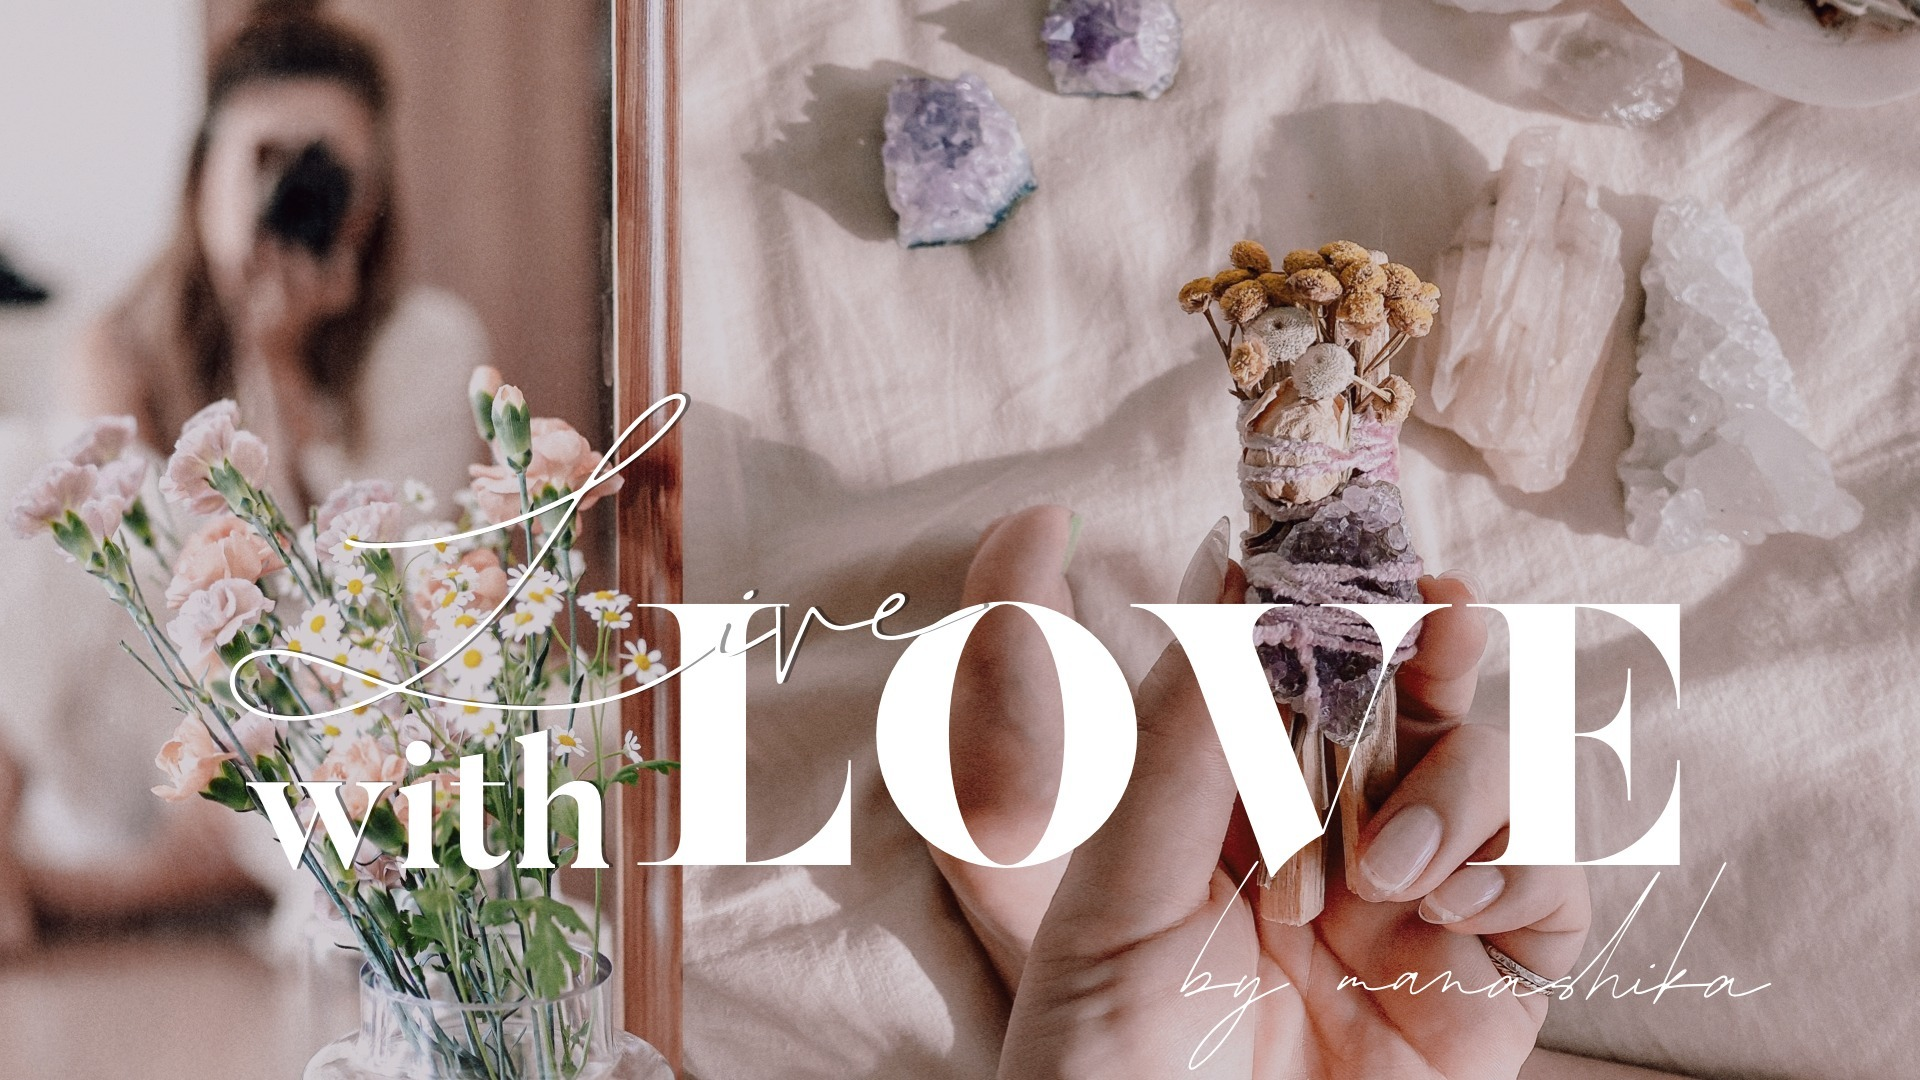 Manashikaのオンラインサロン【Live with love】